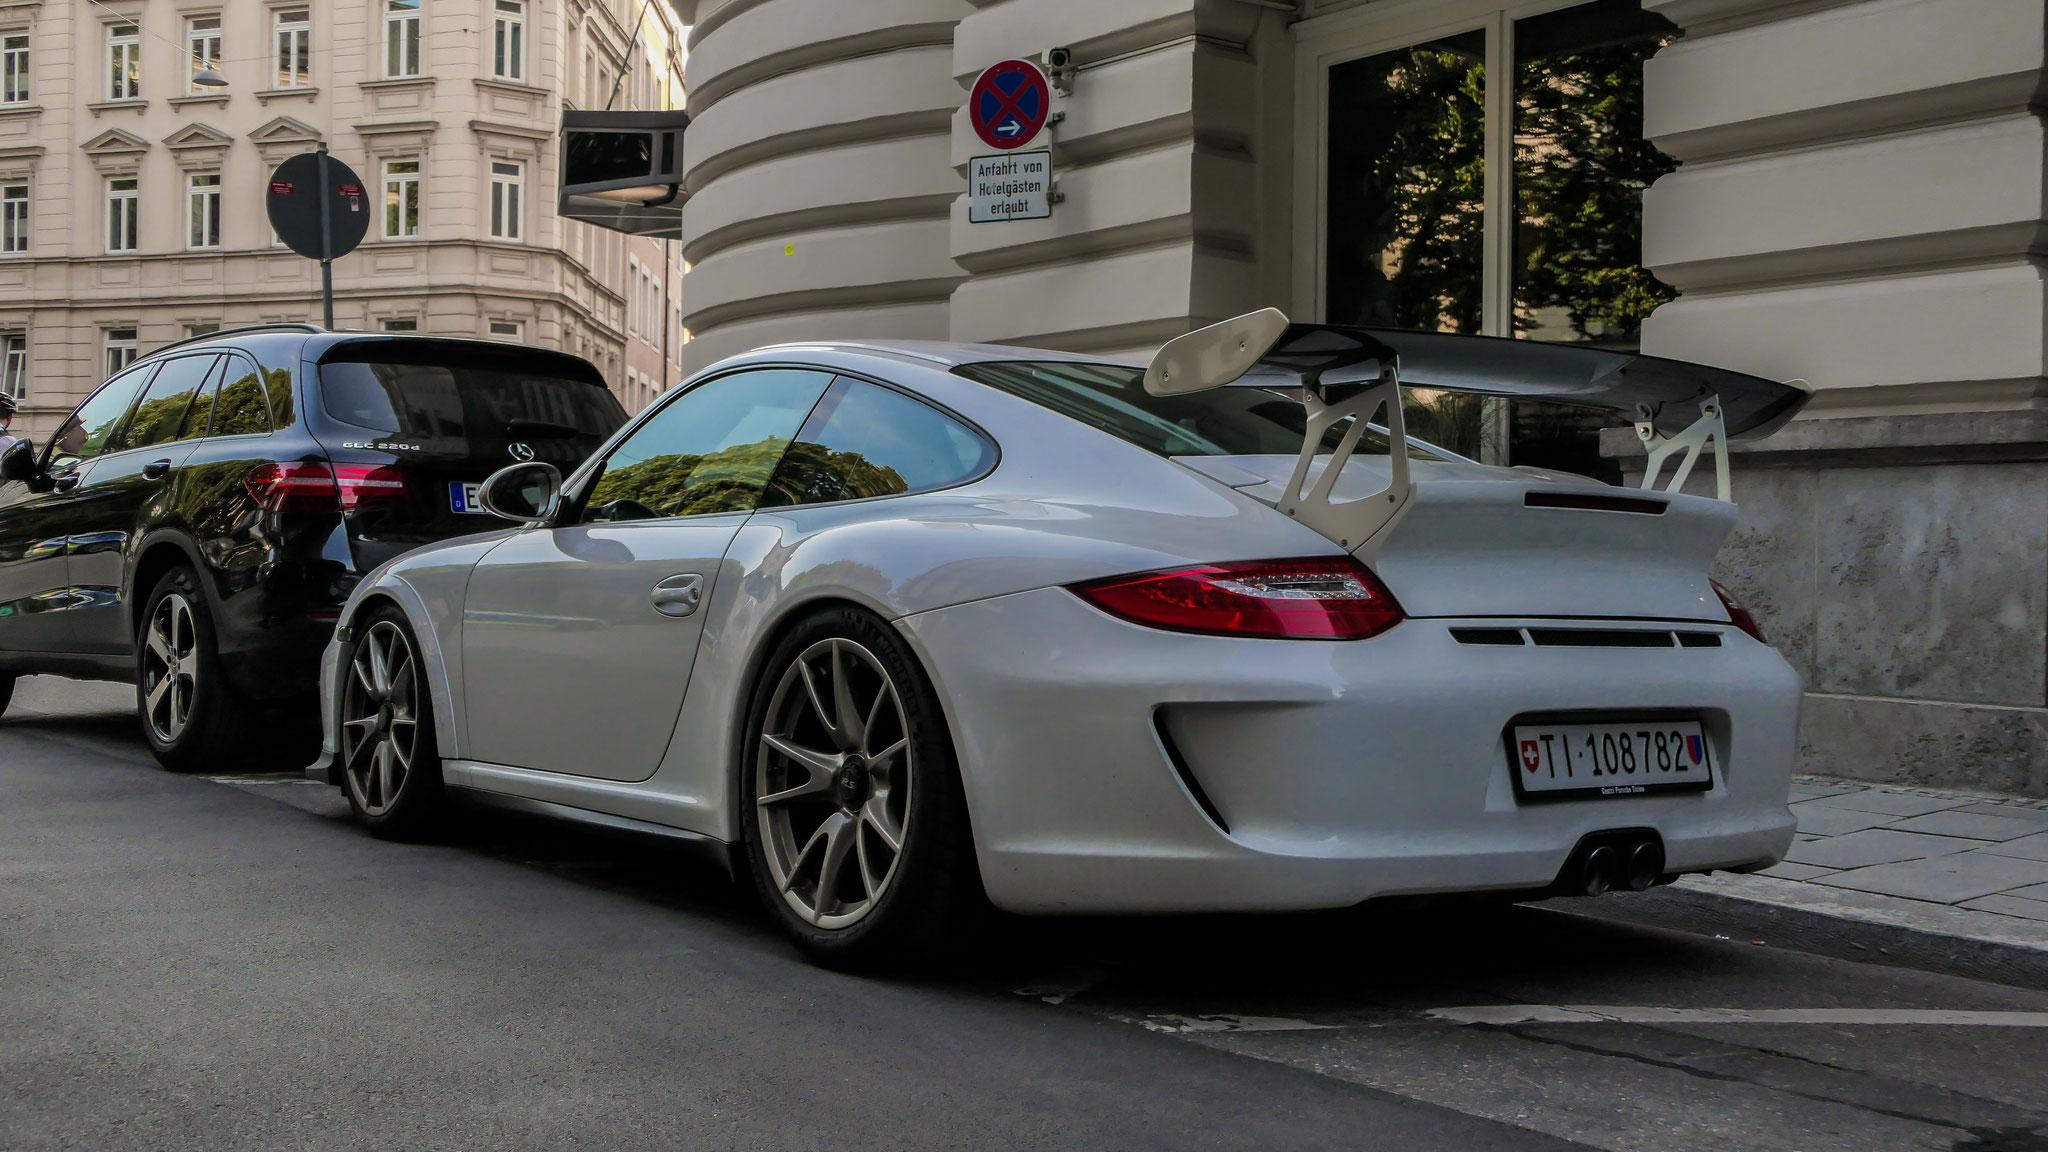 Porsche 911 GT3 RS - TI-108782 (CH)